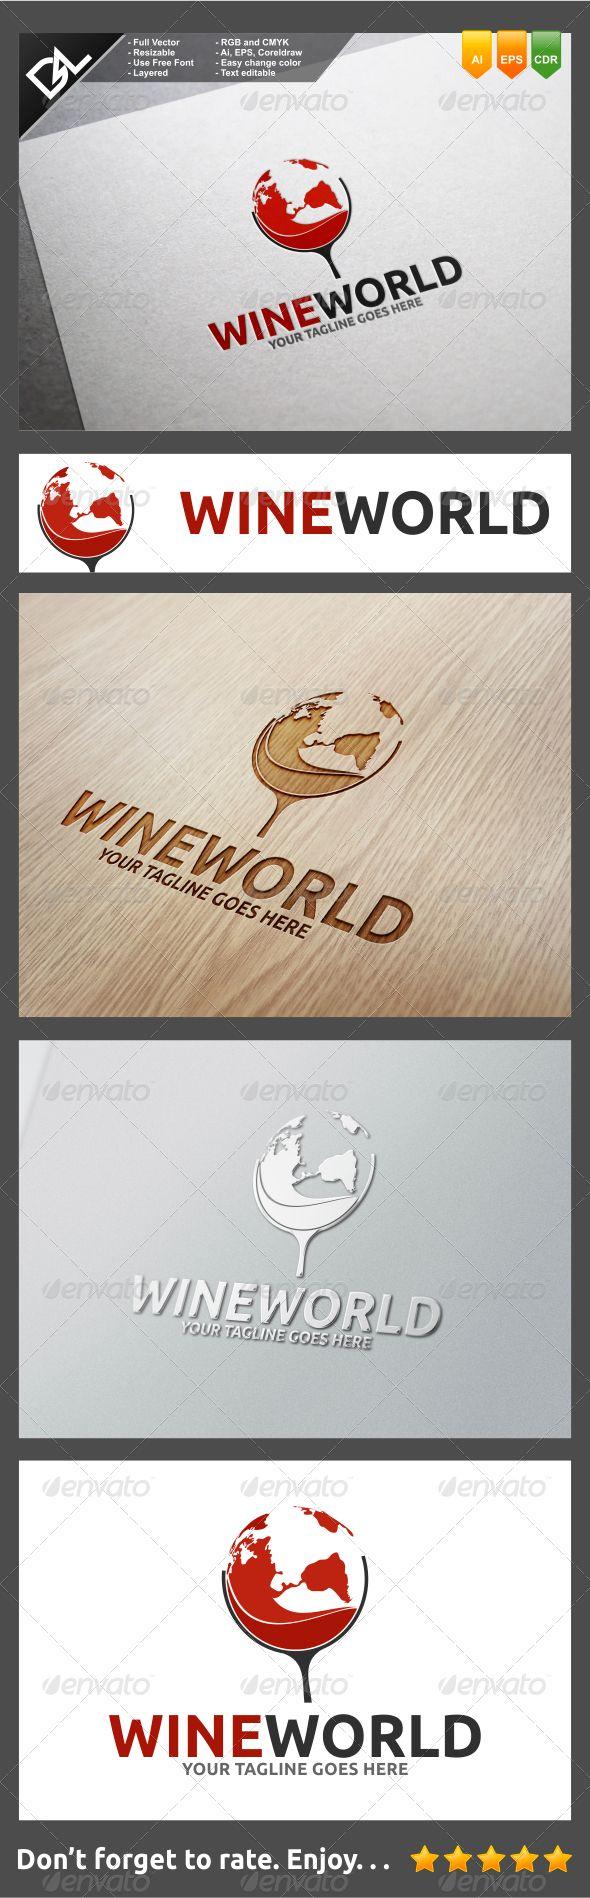 Wine World Logo Design Template Vector #logotype Download it here: http://graphicriver.net/item/wine-world/8292335?s_rank=158?ref=nexion